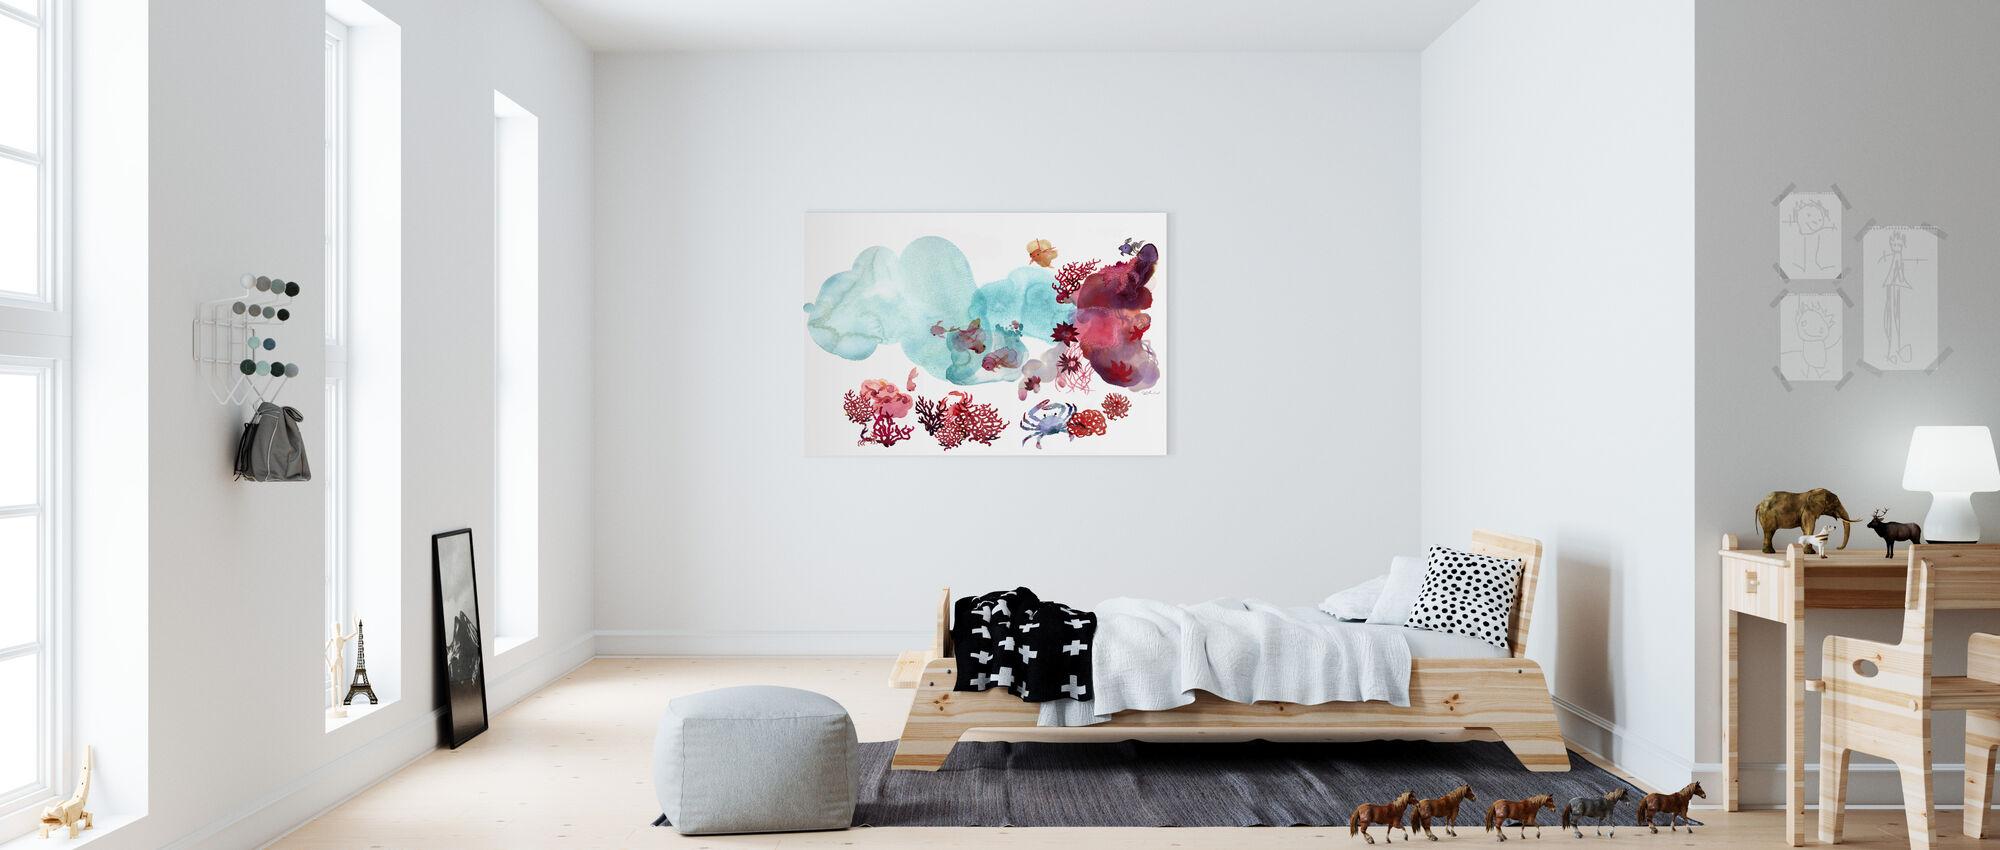 Vattenfärg Korall III - Canvastavla - Barnrum